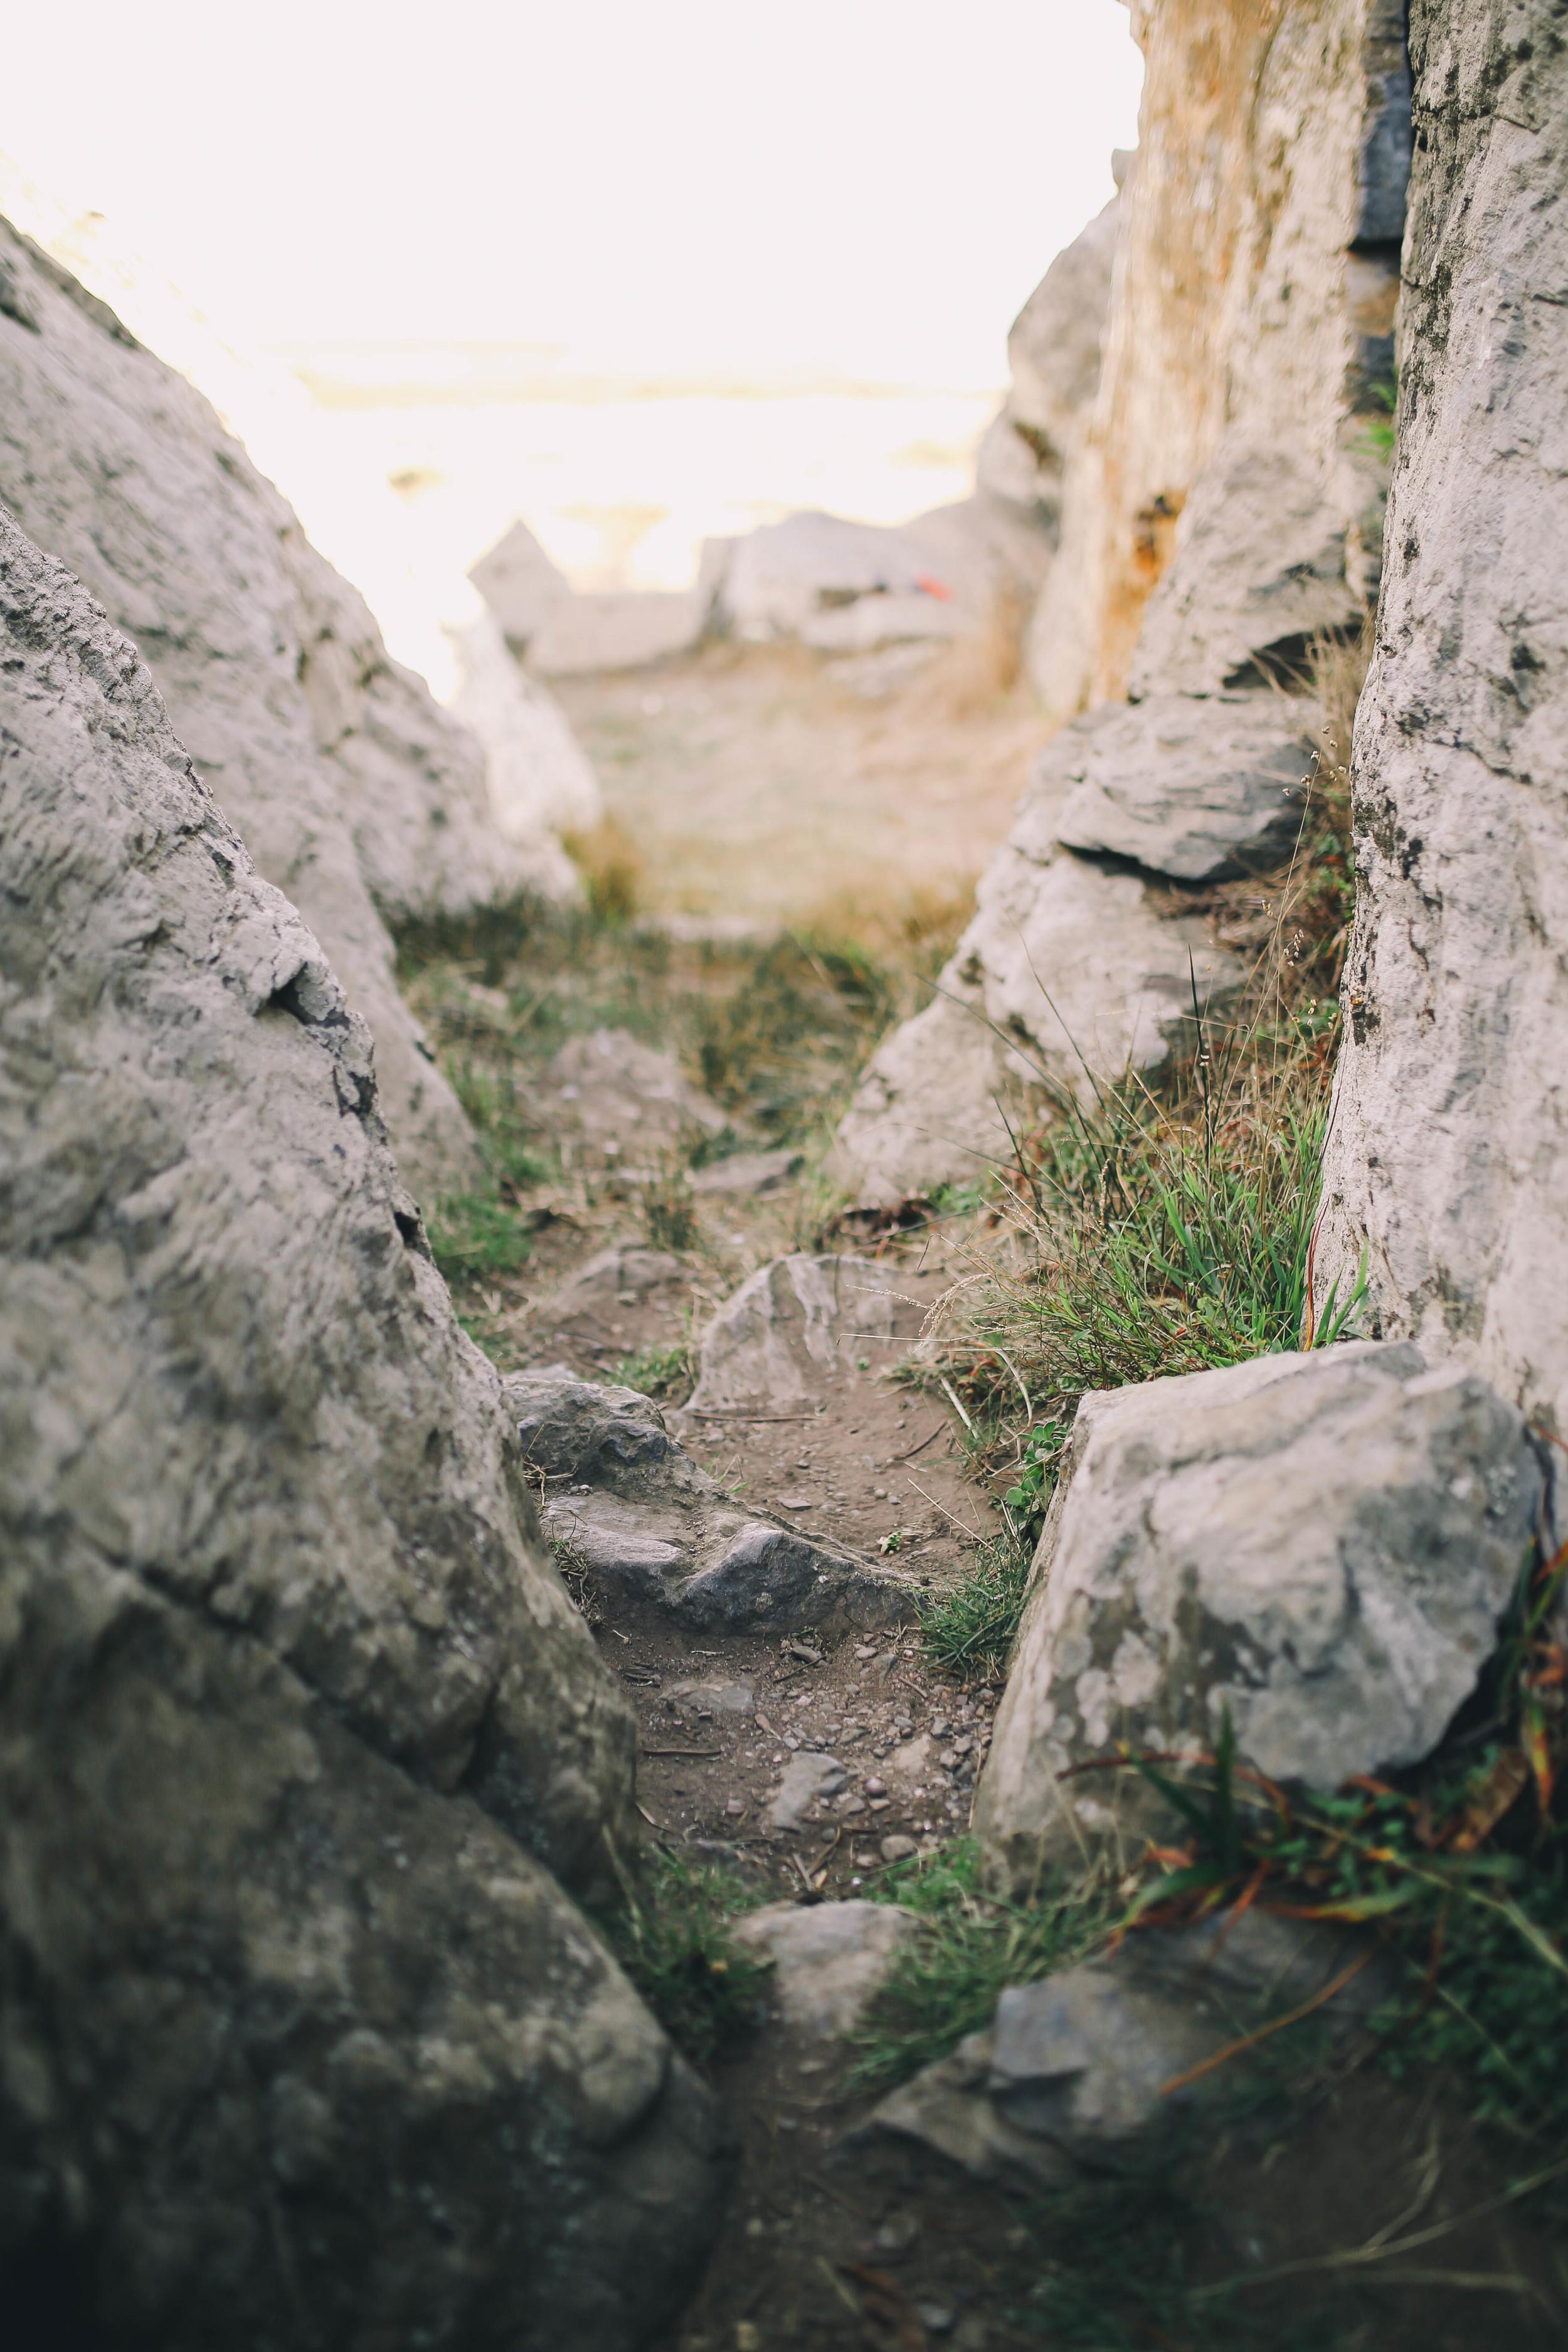 rocks-bodega-bay-california-ocean